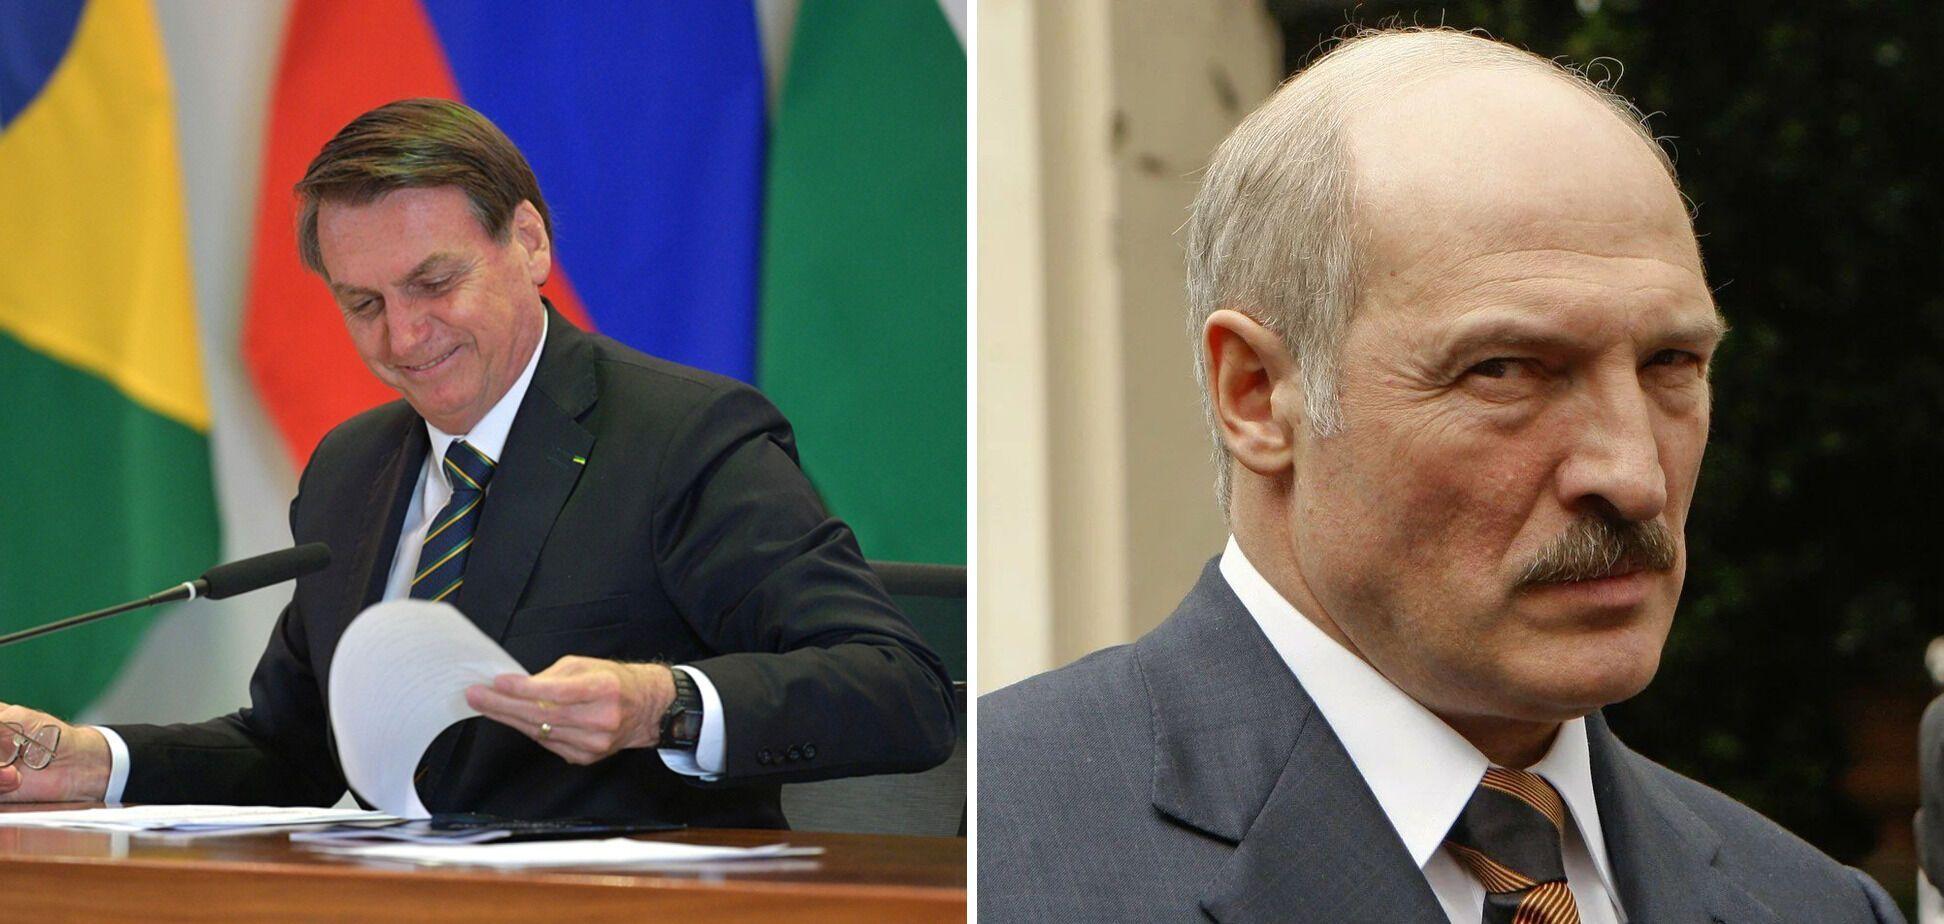 Жаир Болсонар и Александр Лукашенко